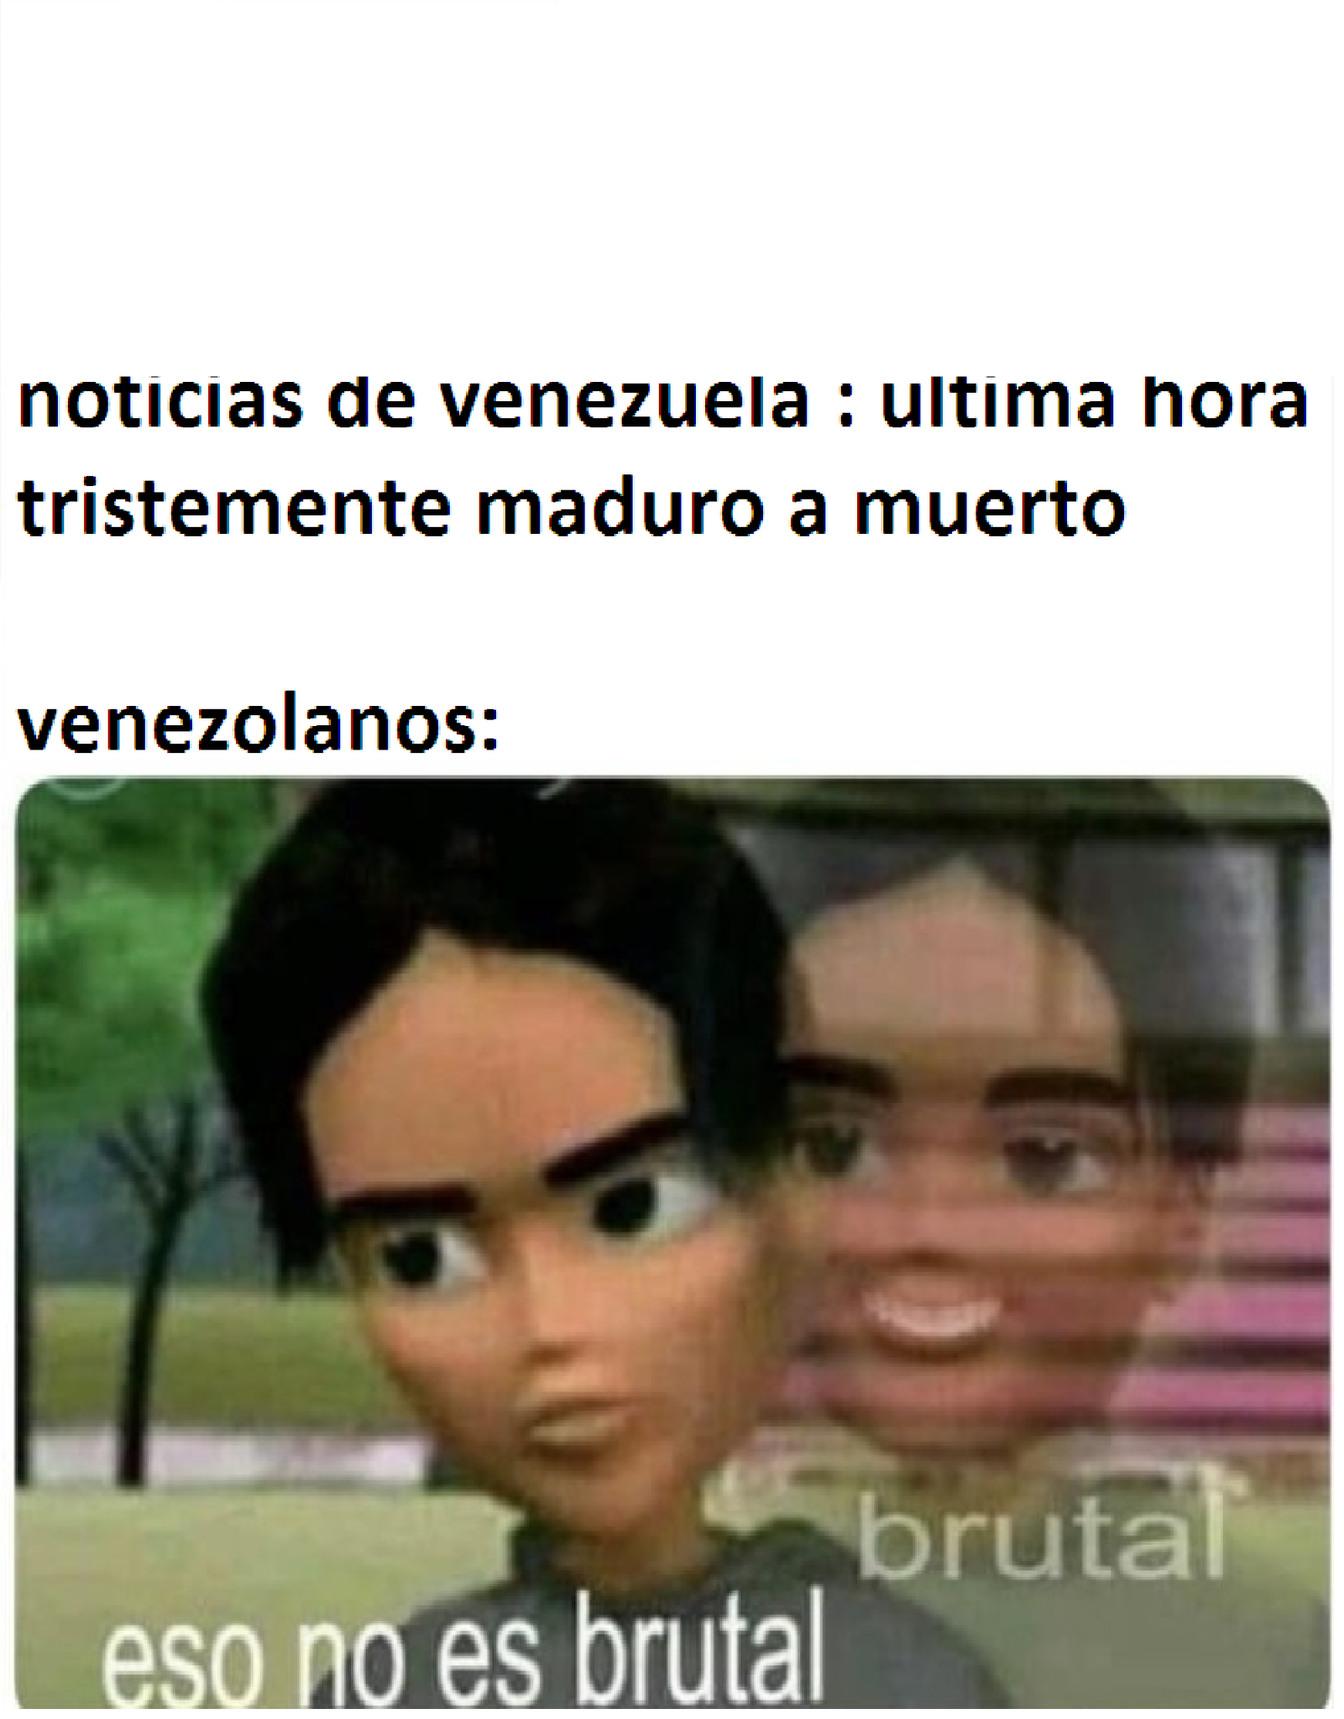 venezolanos be like - meme